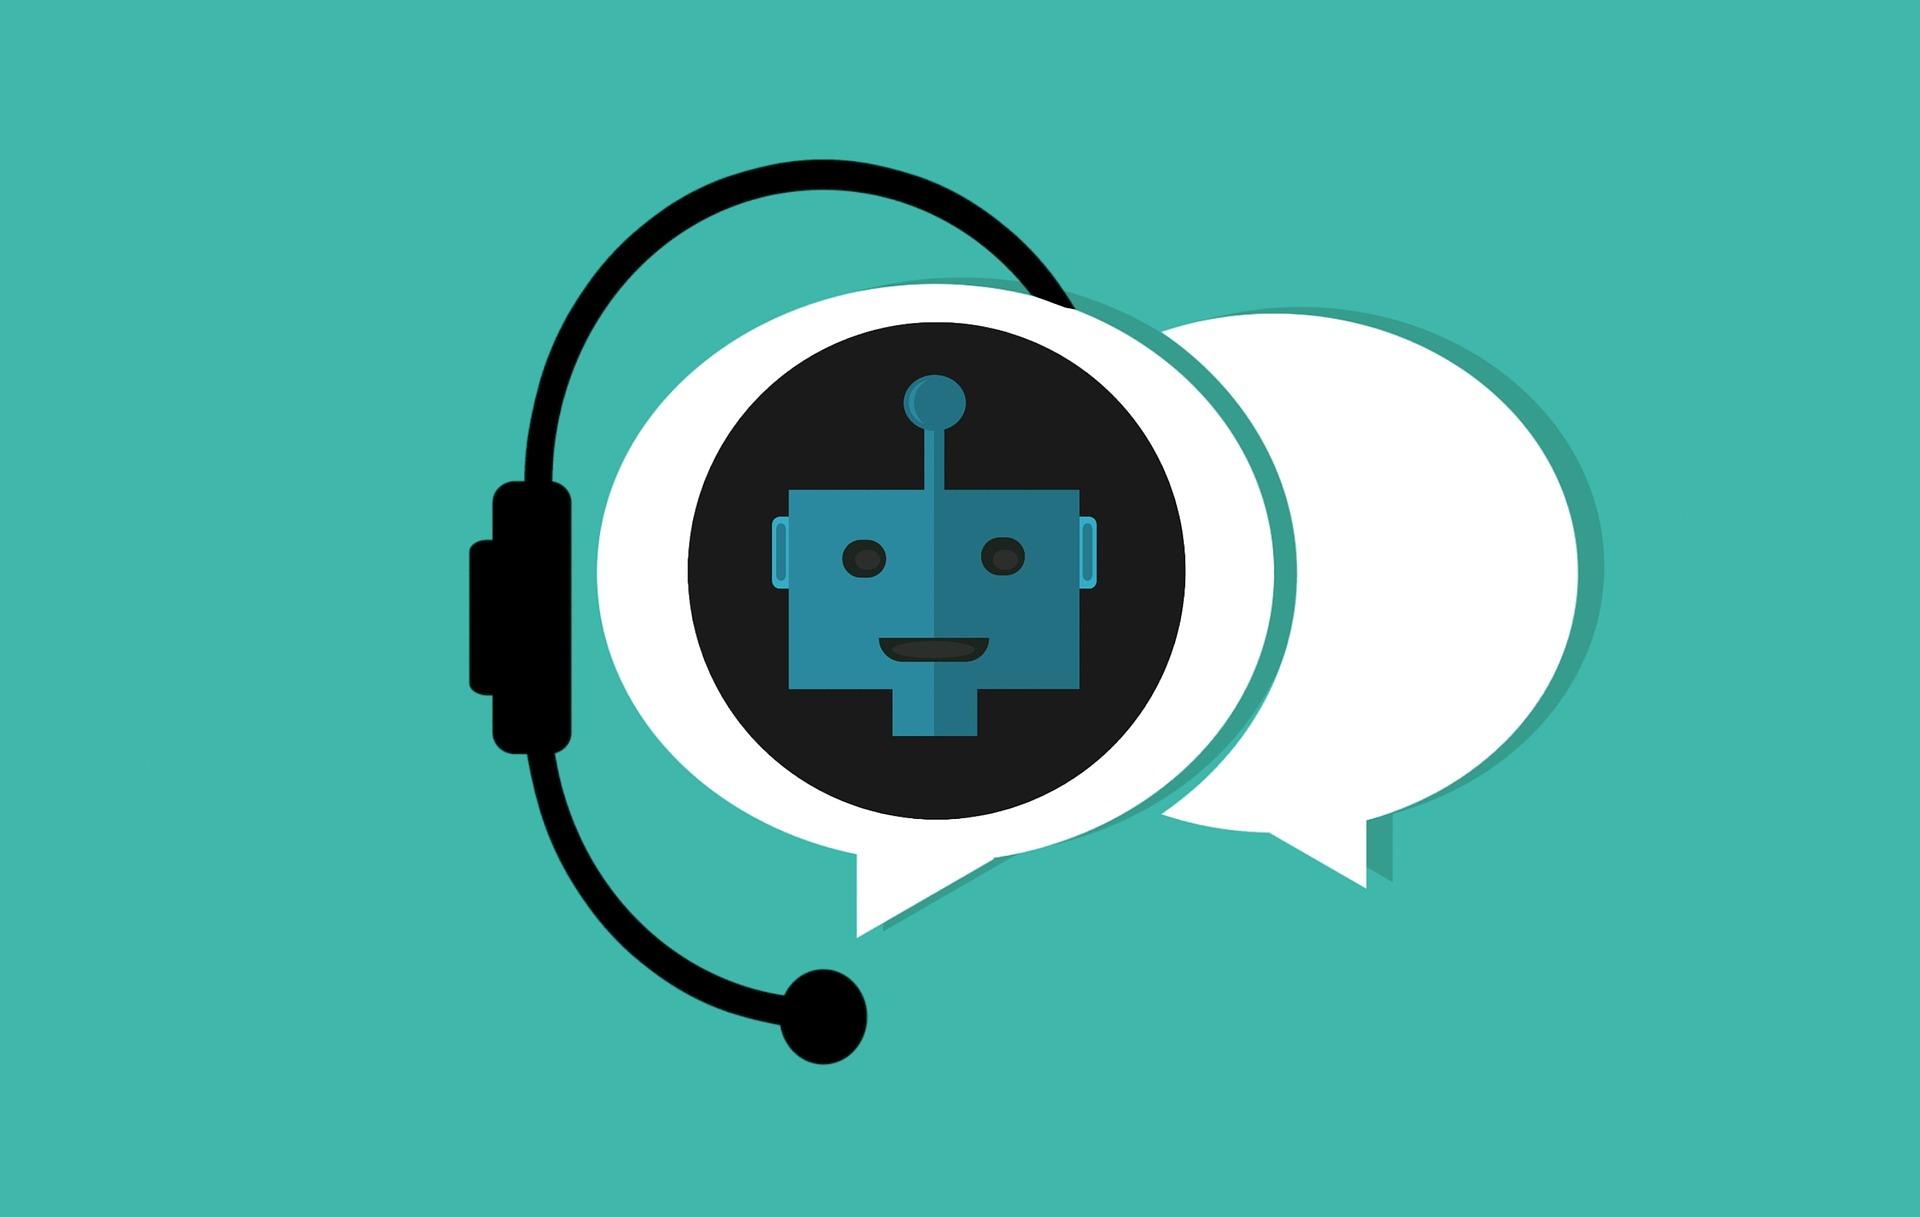 Chatbot art